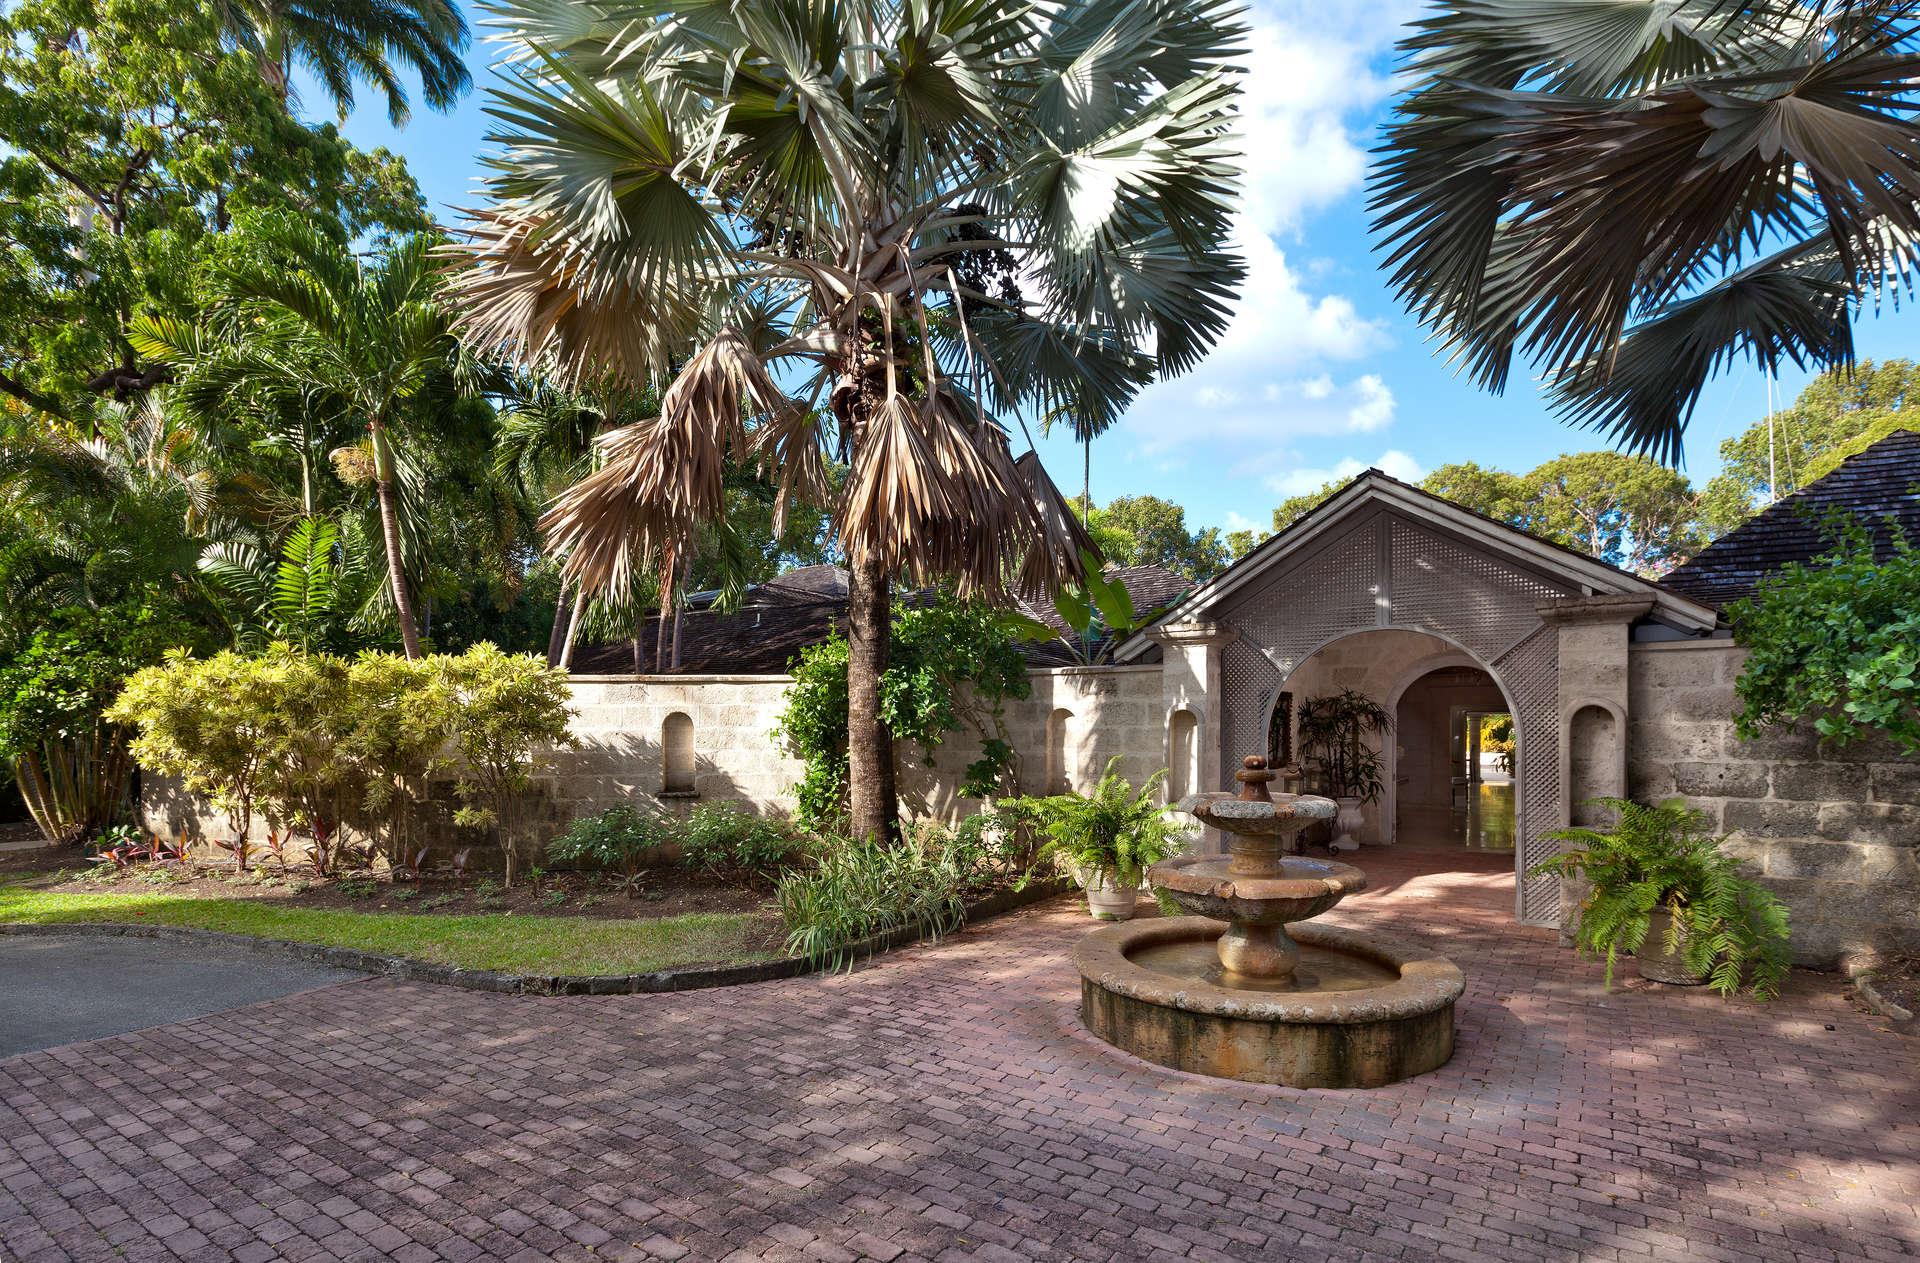 Luxury villa rentals caribbean - Barbados - St james - Sandy lane - Bluff House - Image 1/16